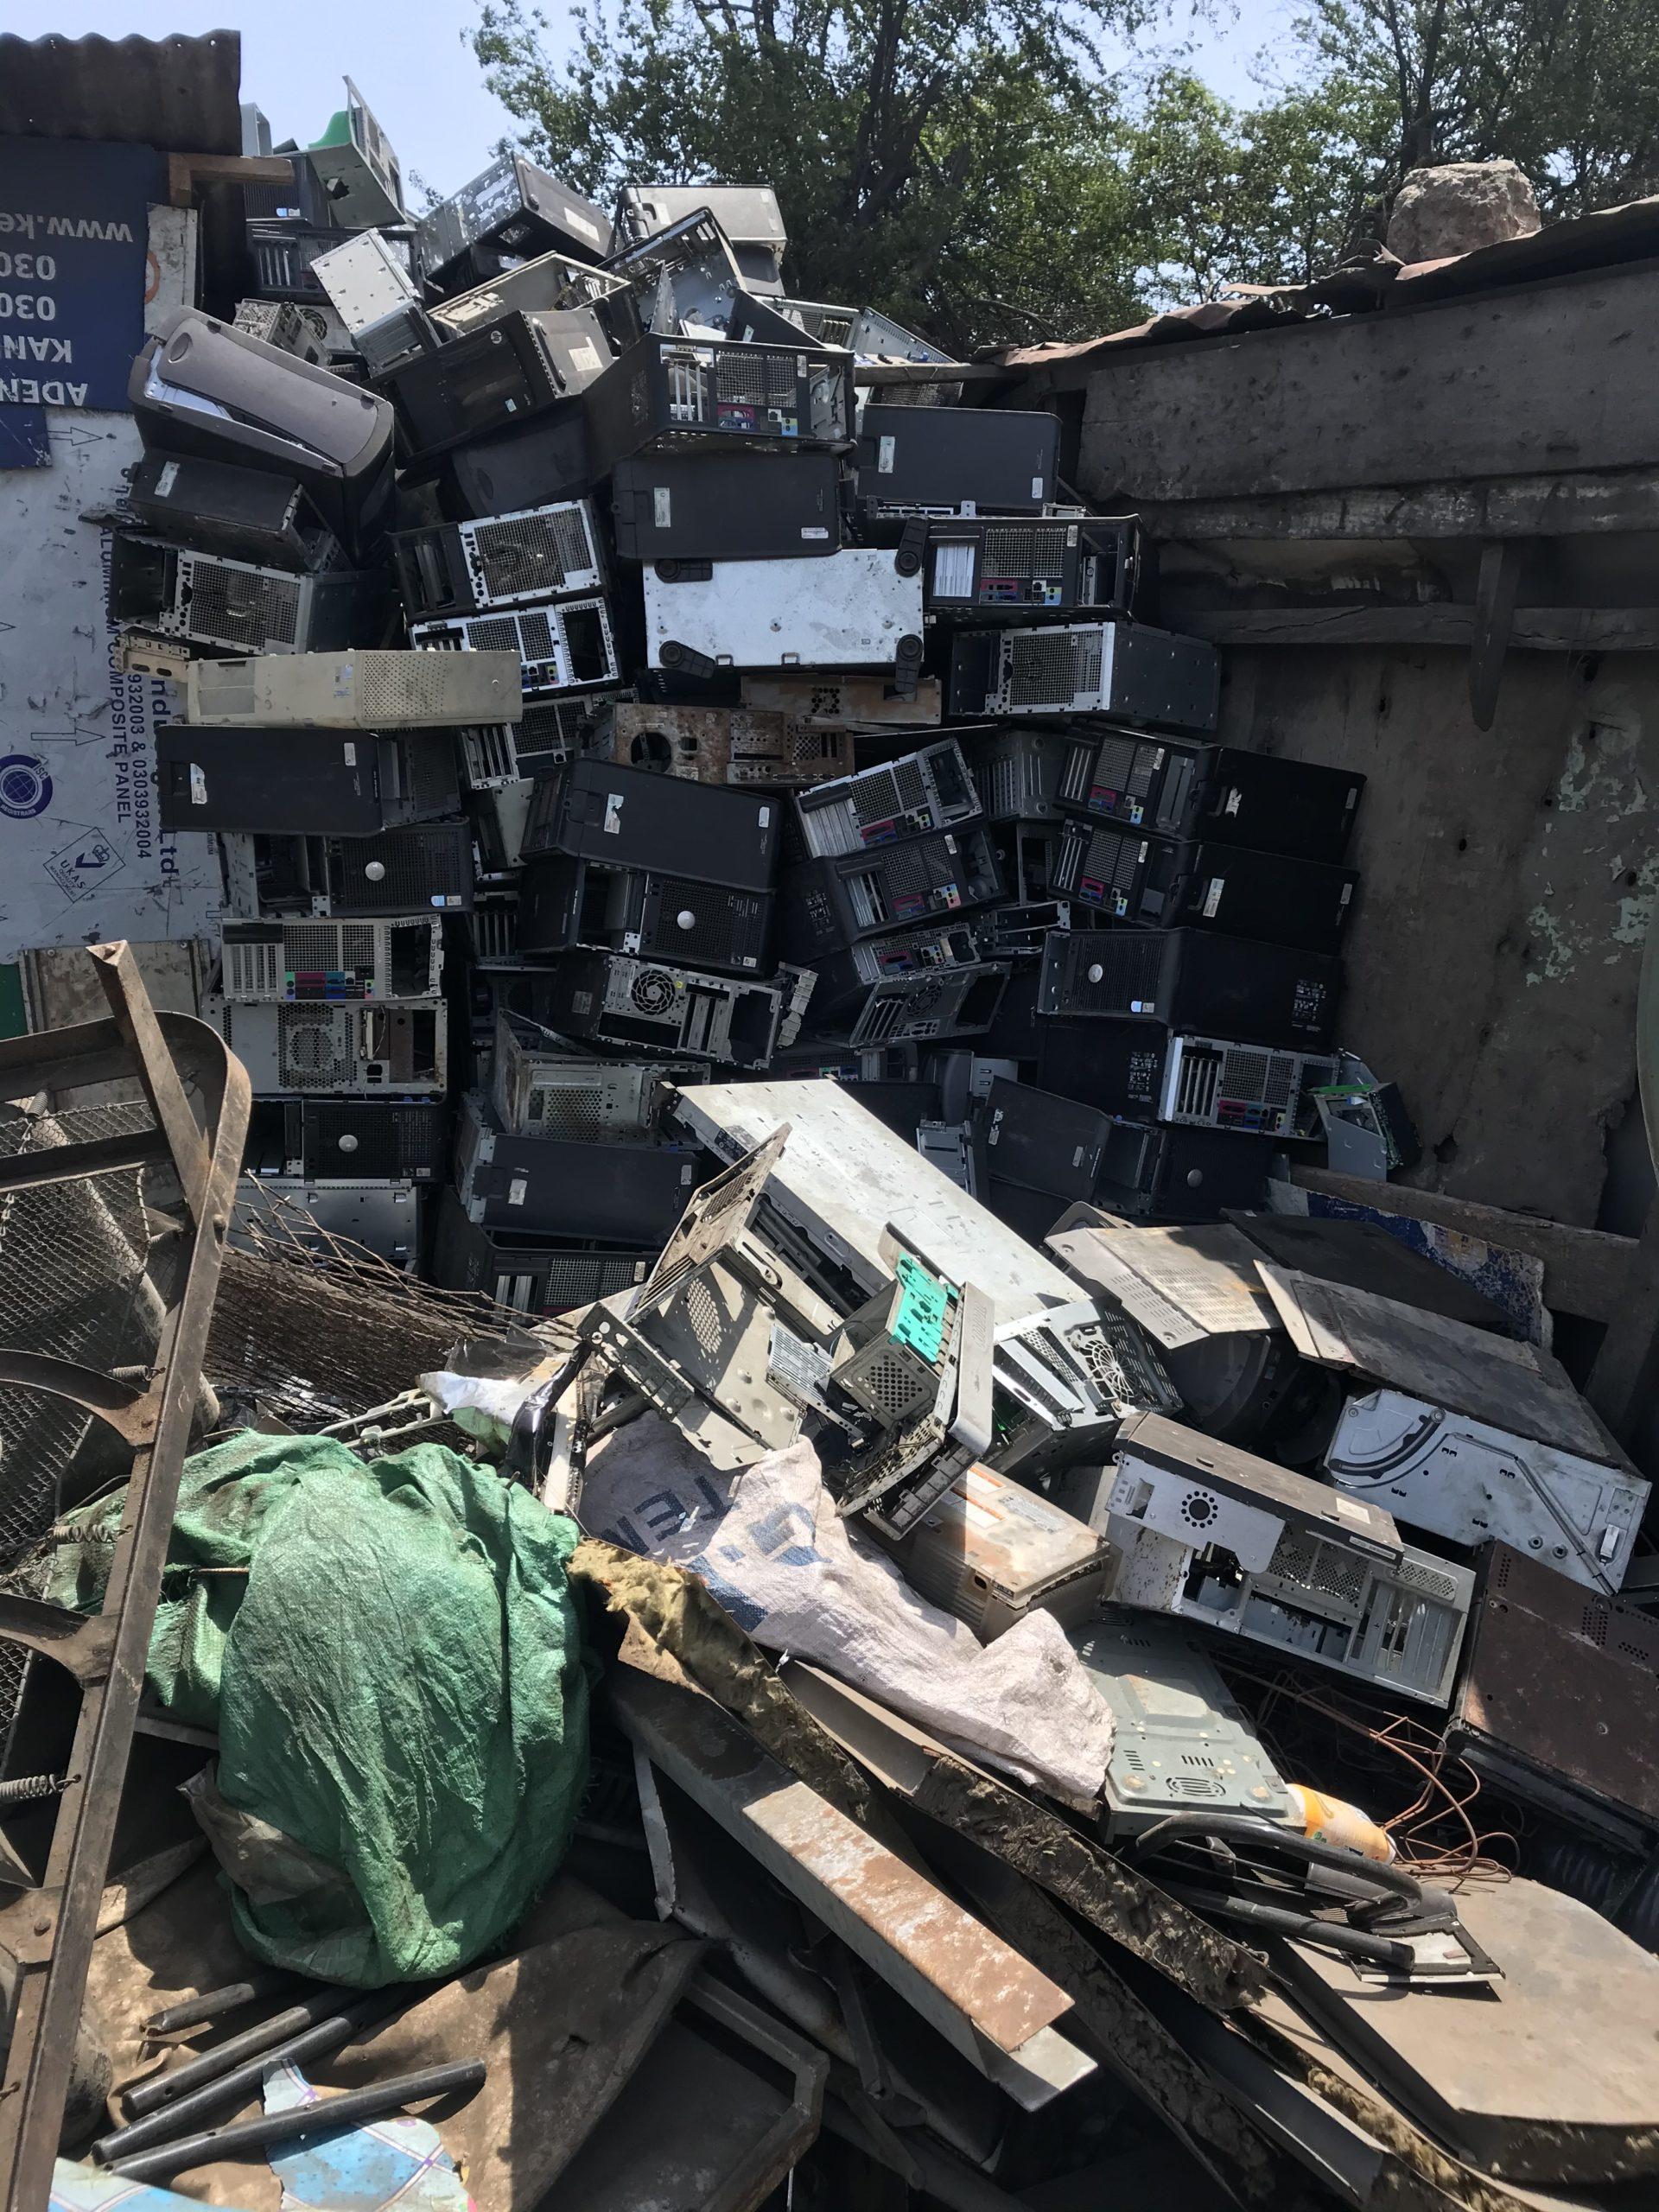 Image of e-waste in Ghana